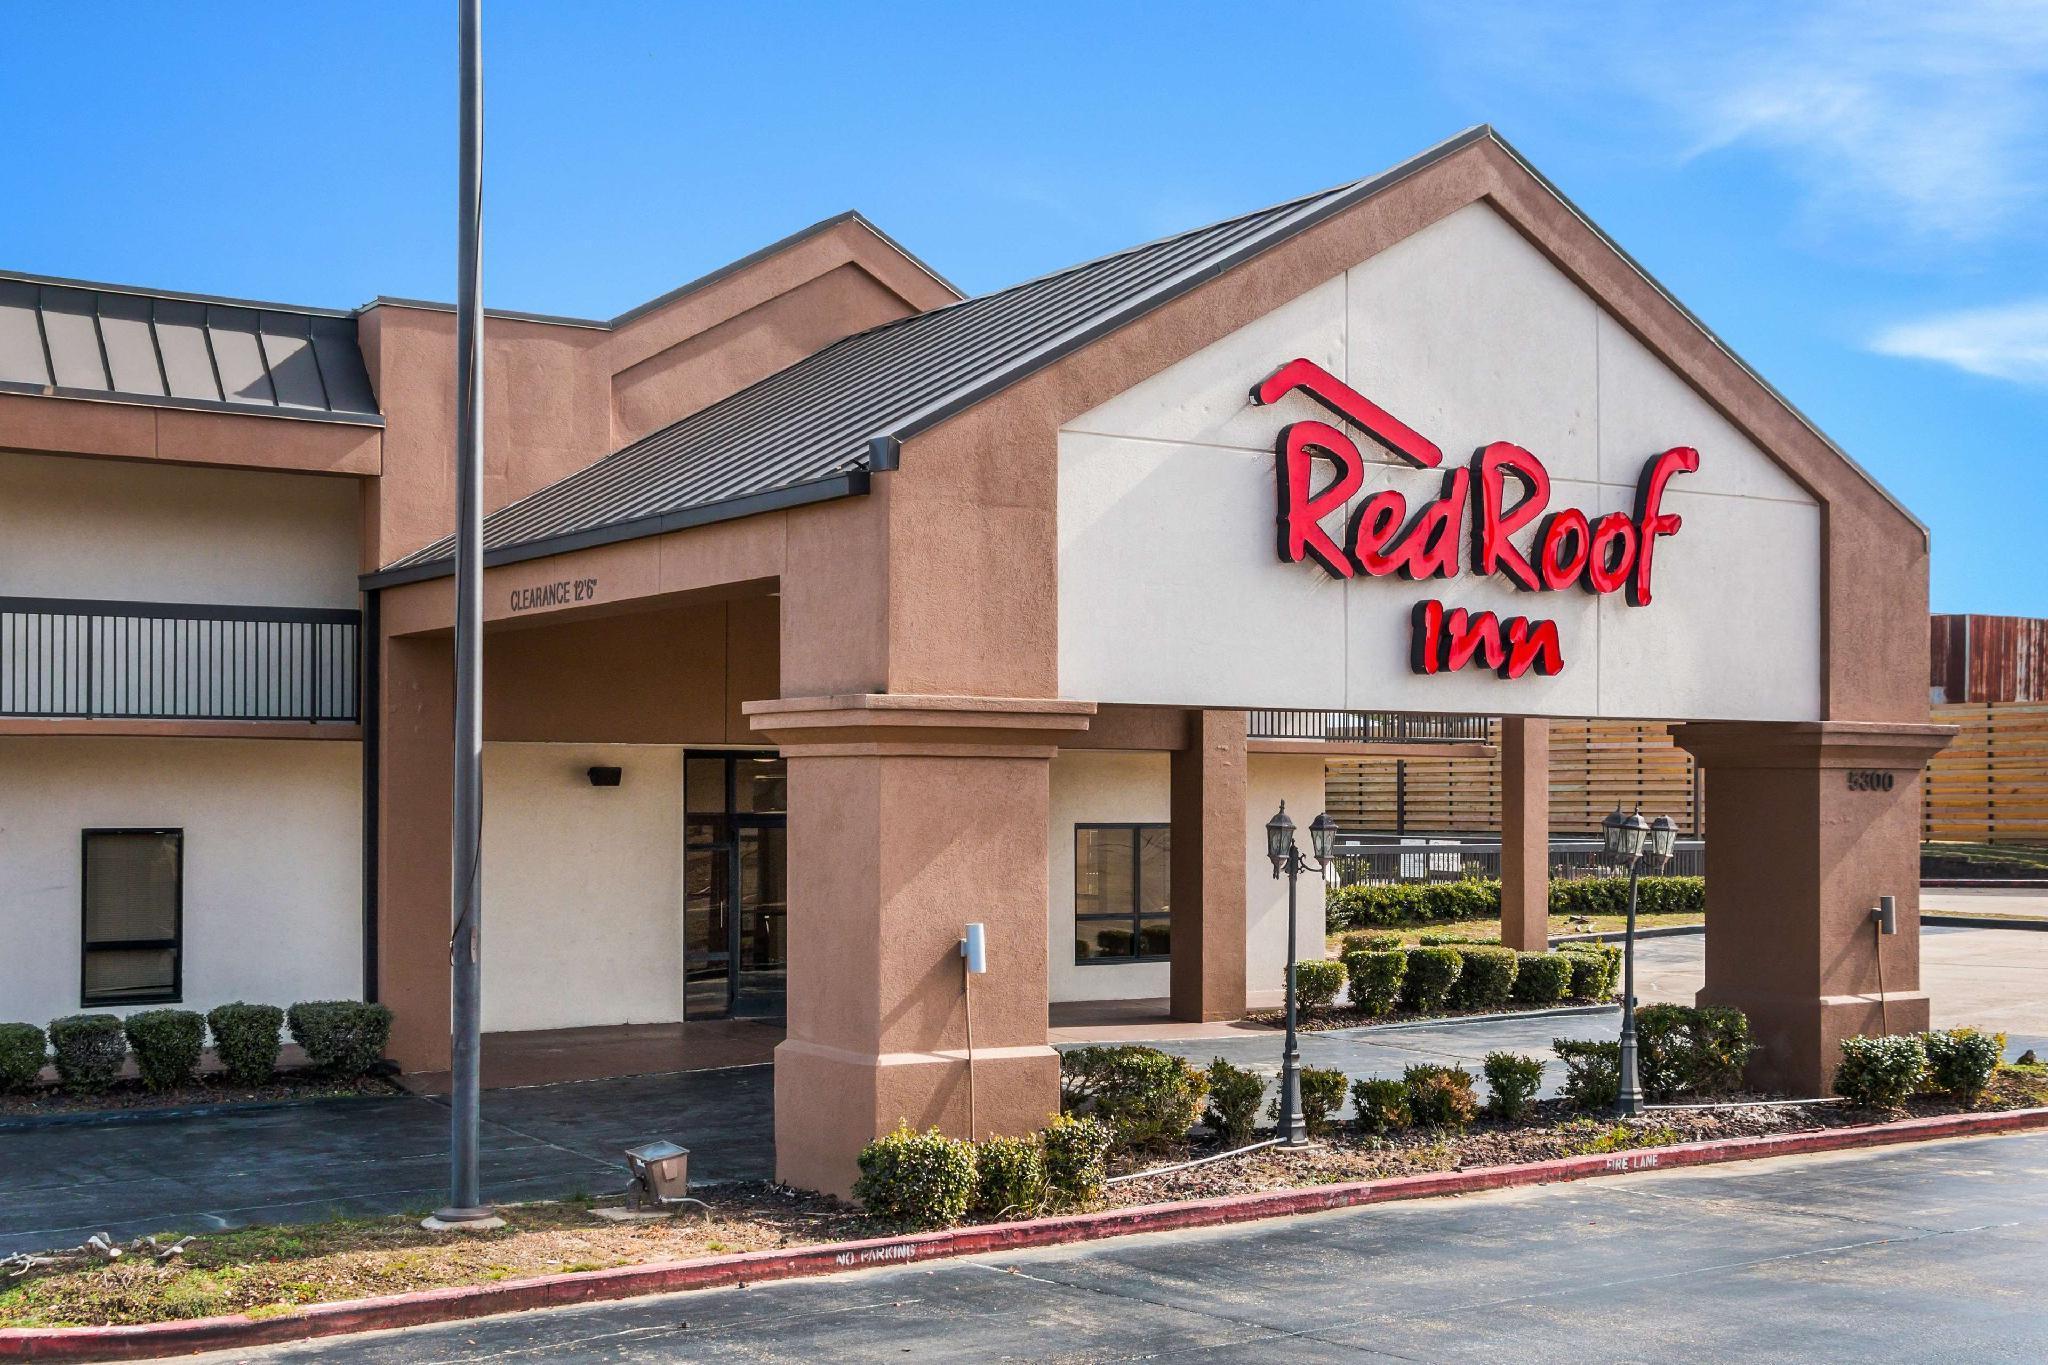 Red Roof Inn Texarkana